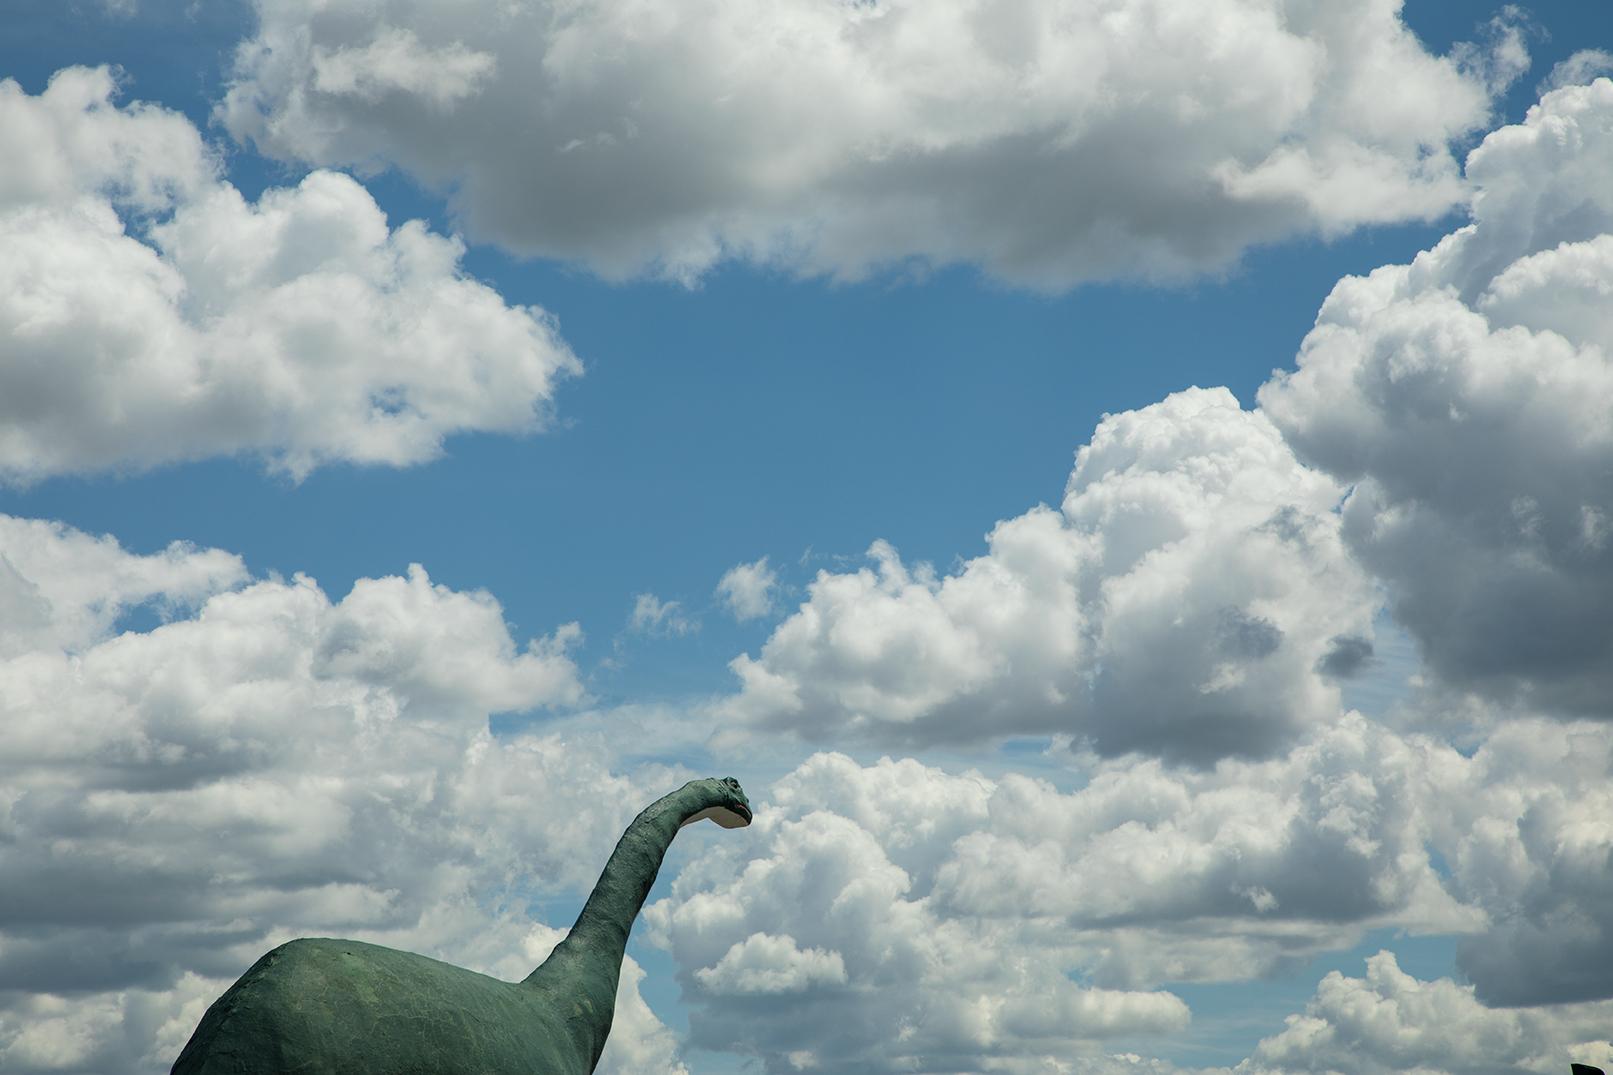 Wall-Dino_web.jpg